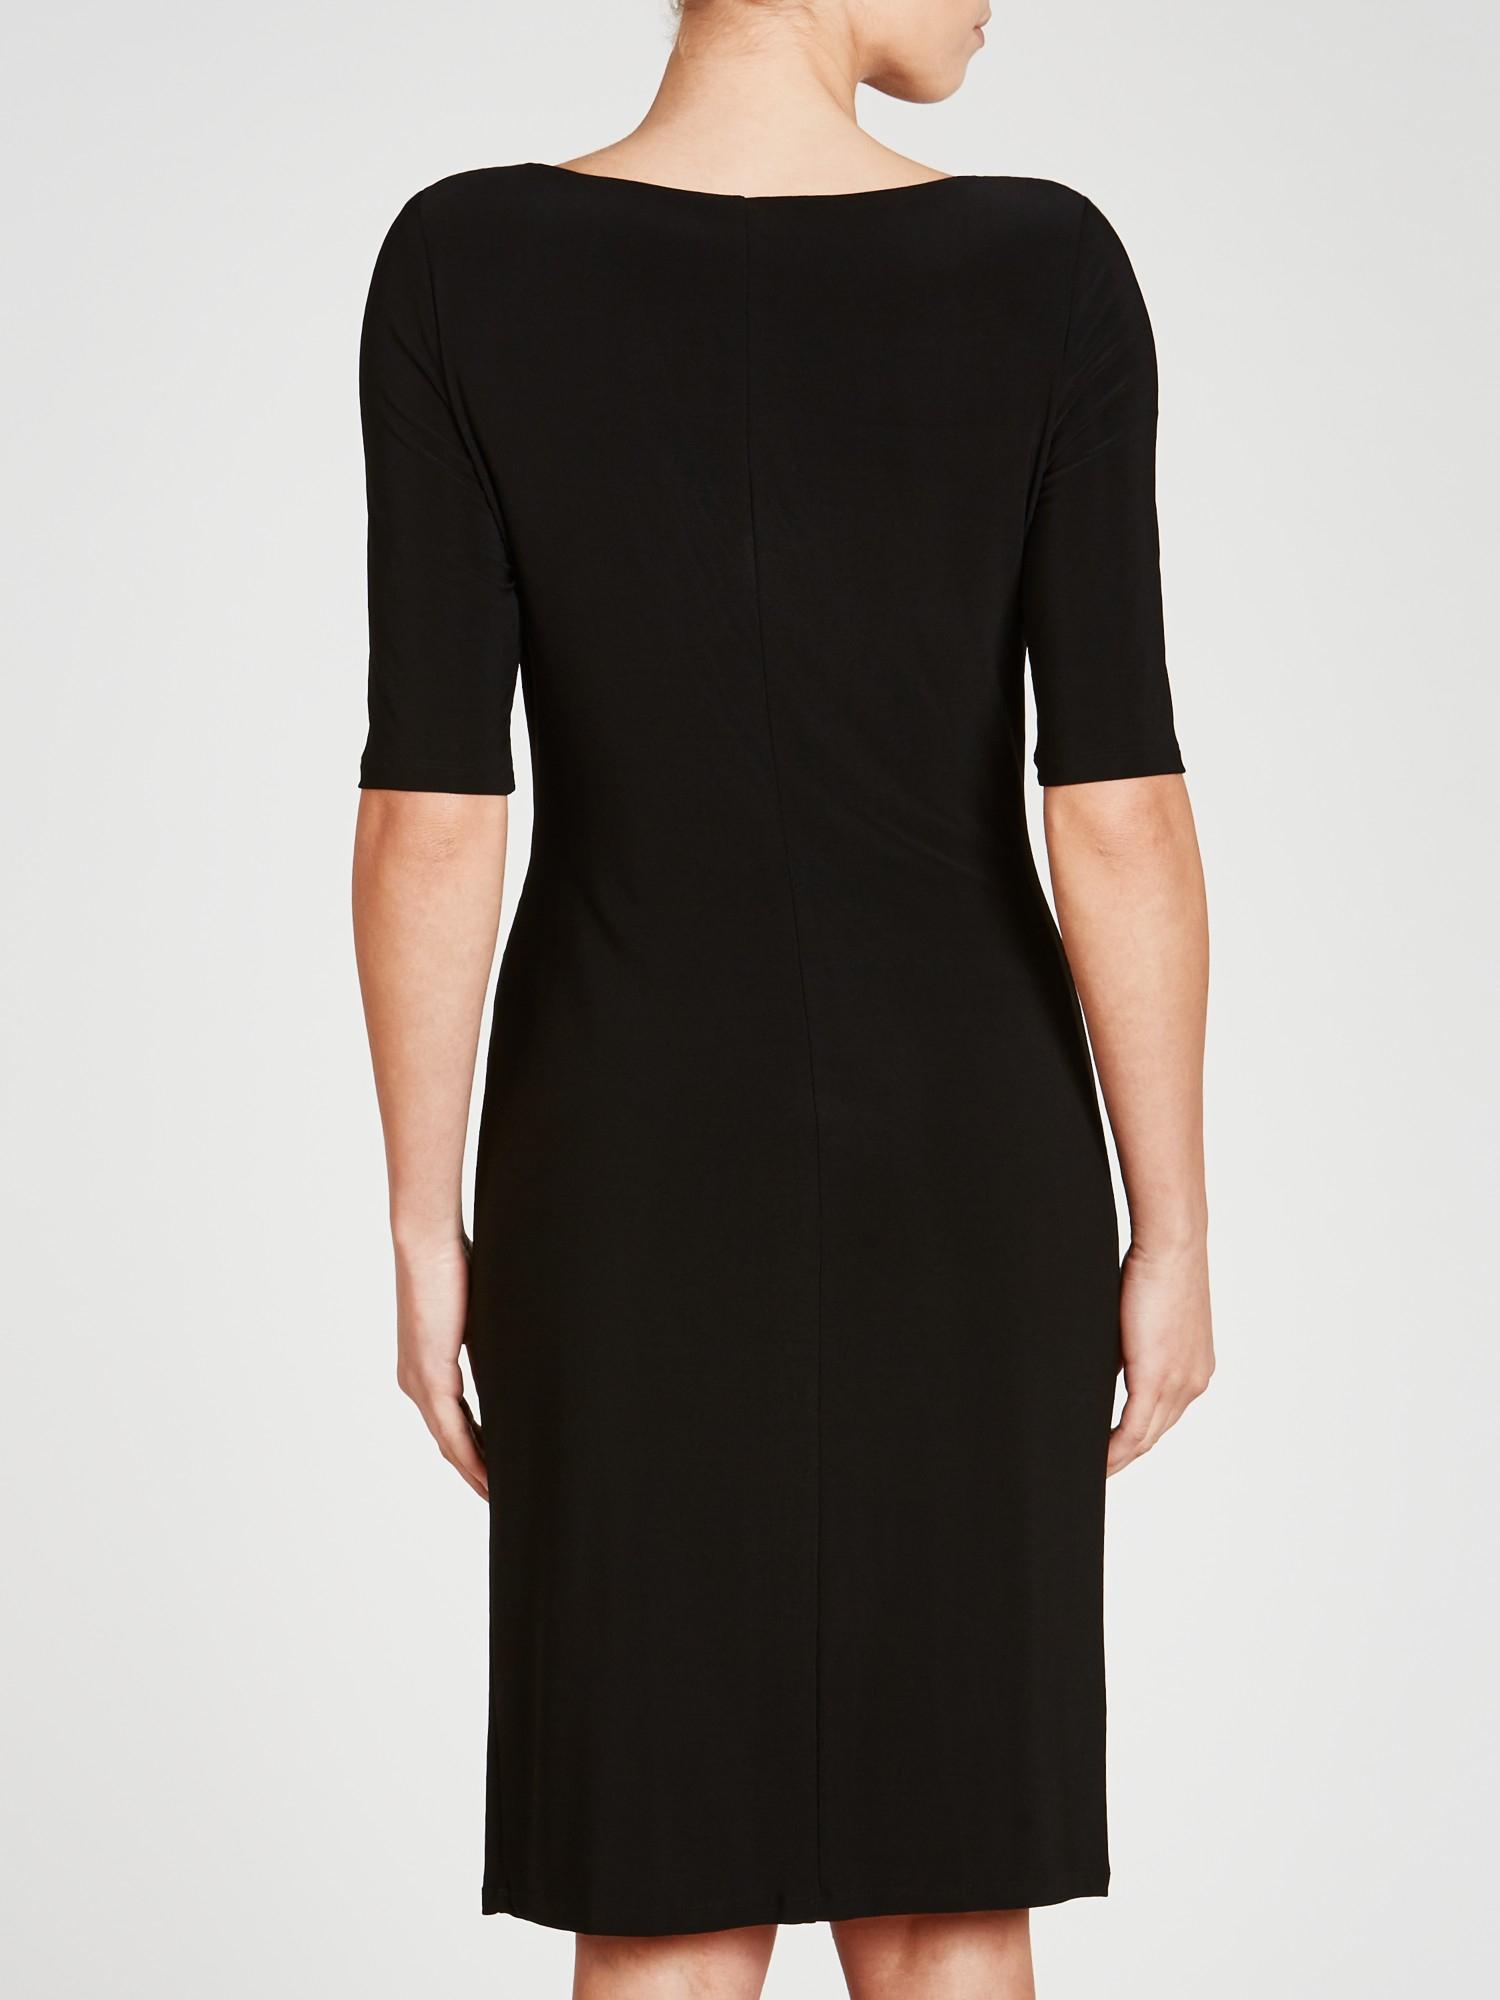 Lauren By Ralph Lauren Carleton Dress In Black Lyst